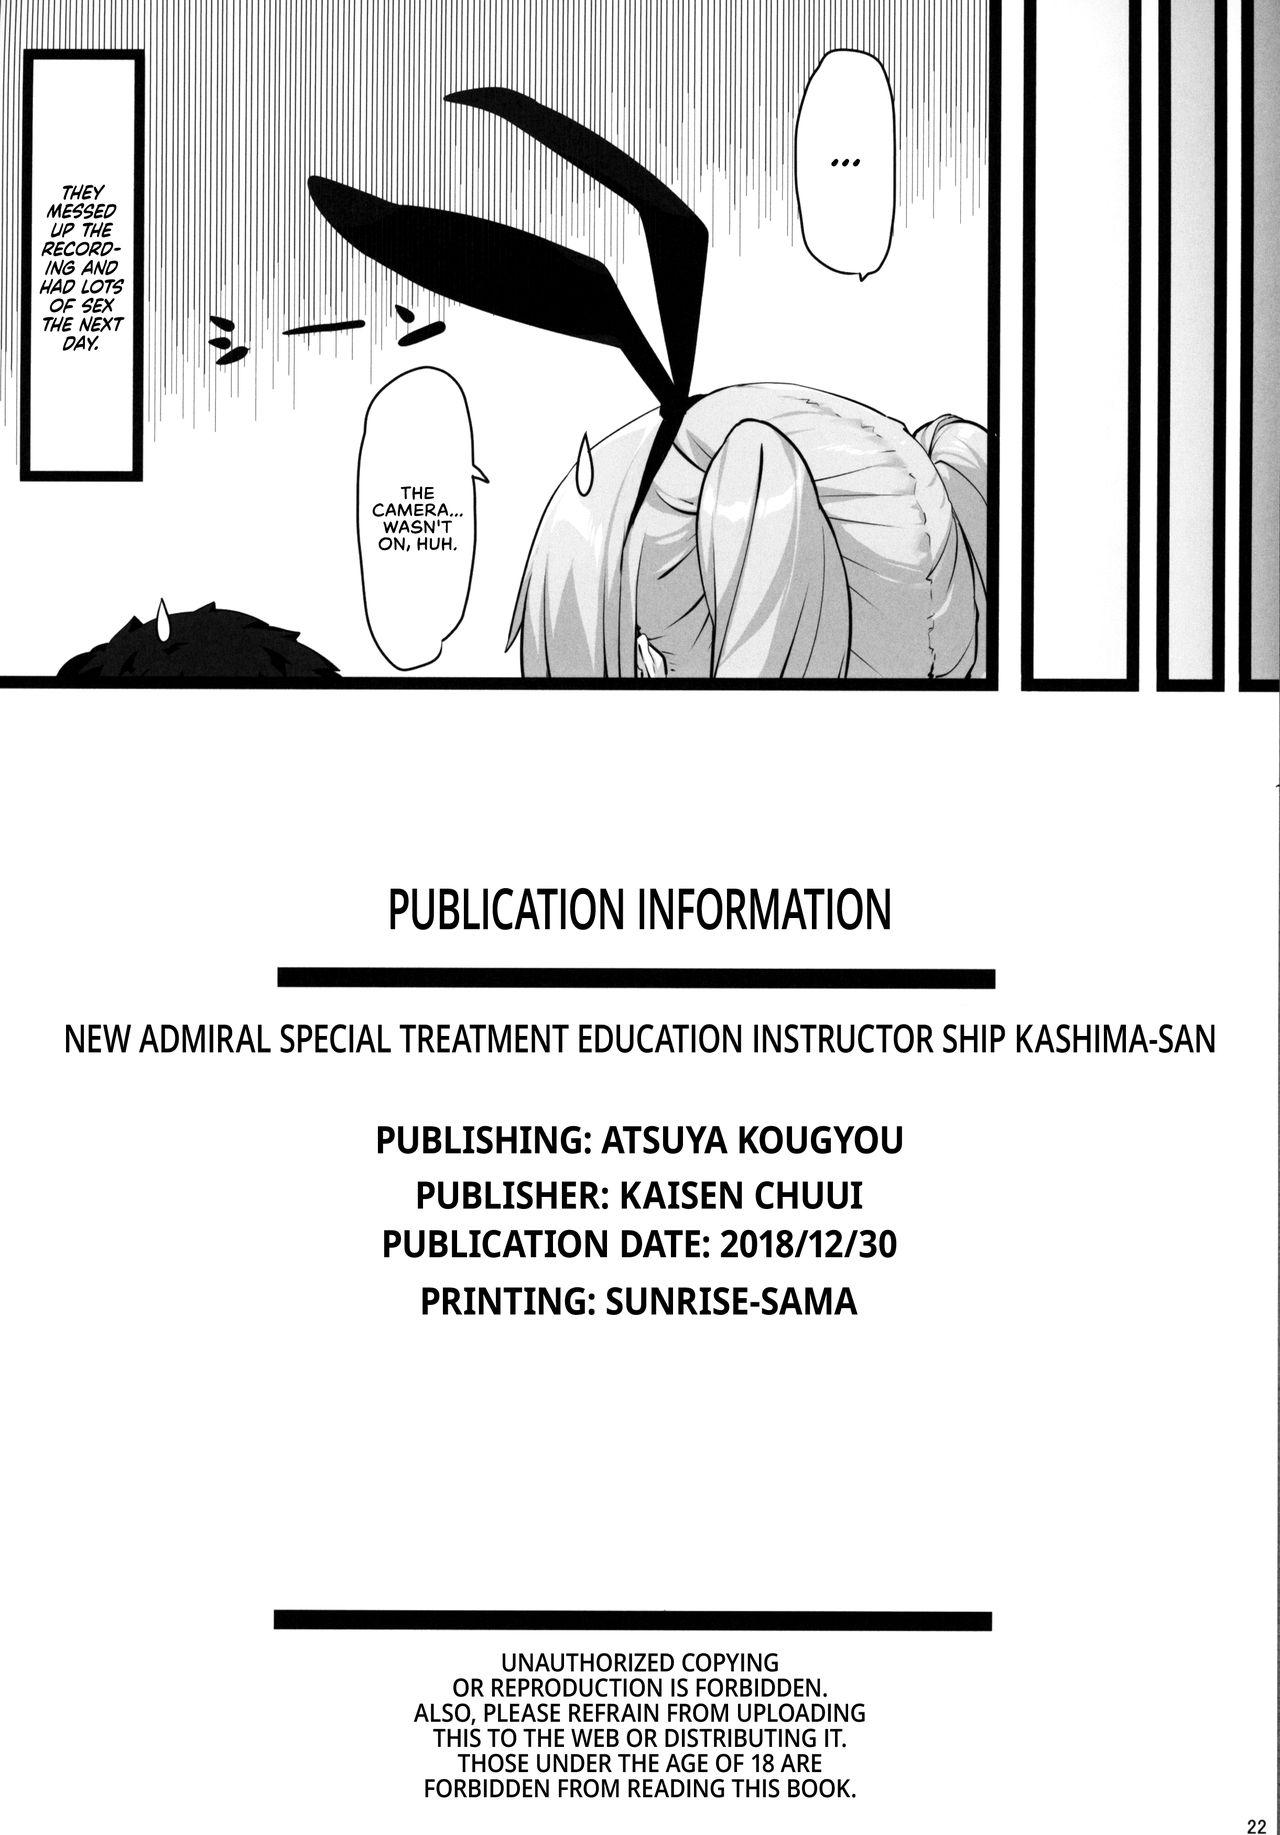 (C95) [Atsuya Kougyou (Kaisen Chuui)] Shinjin Teitoku Tokubetsu Shori Tantoukan Kyoudou Gakari Kashima-san | New Admiral Special Treatment Education Instructor Ship Kashima-san (Kantai Collection -KanColle-) [English] [RedLantern] 21